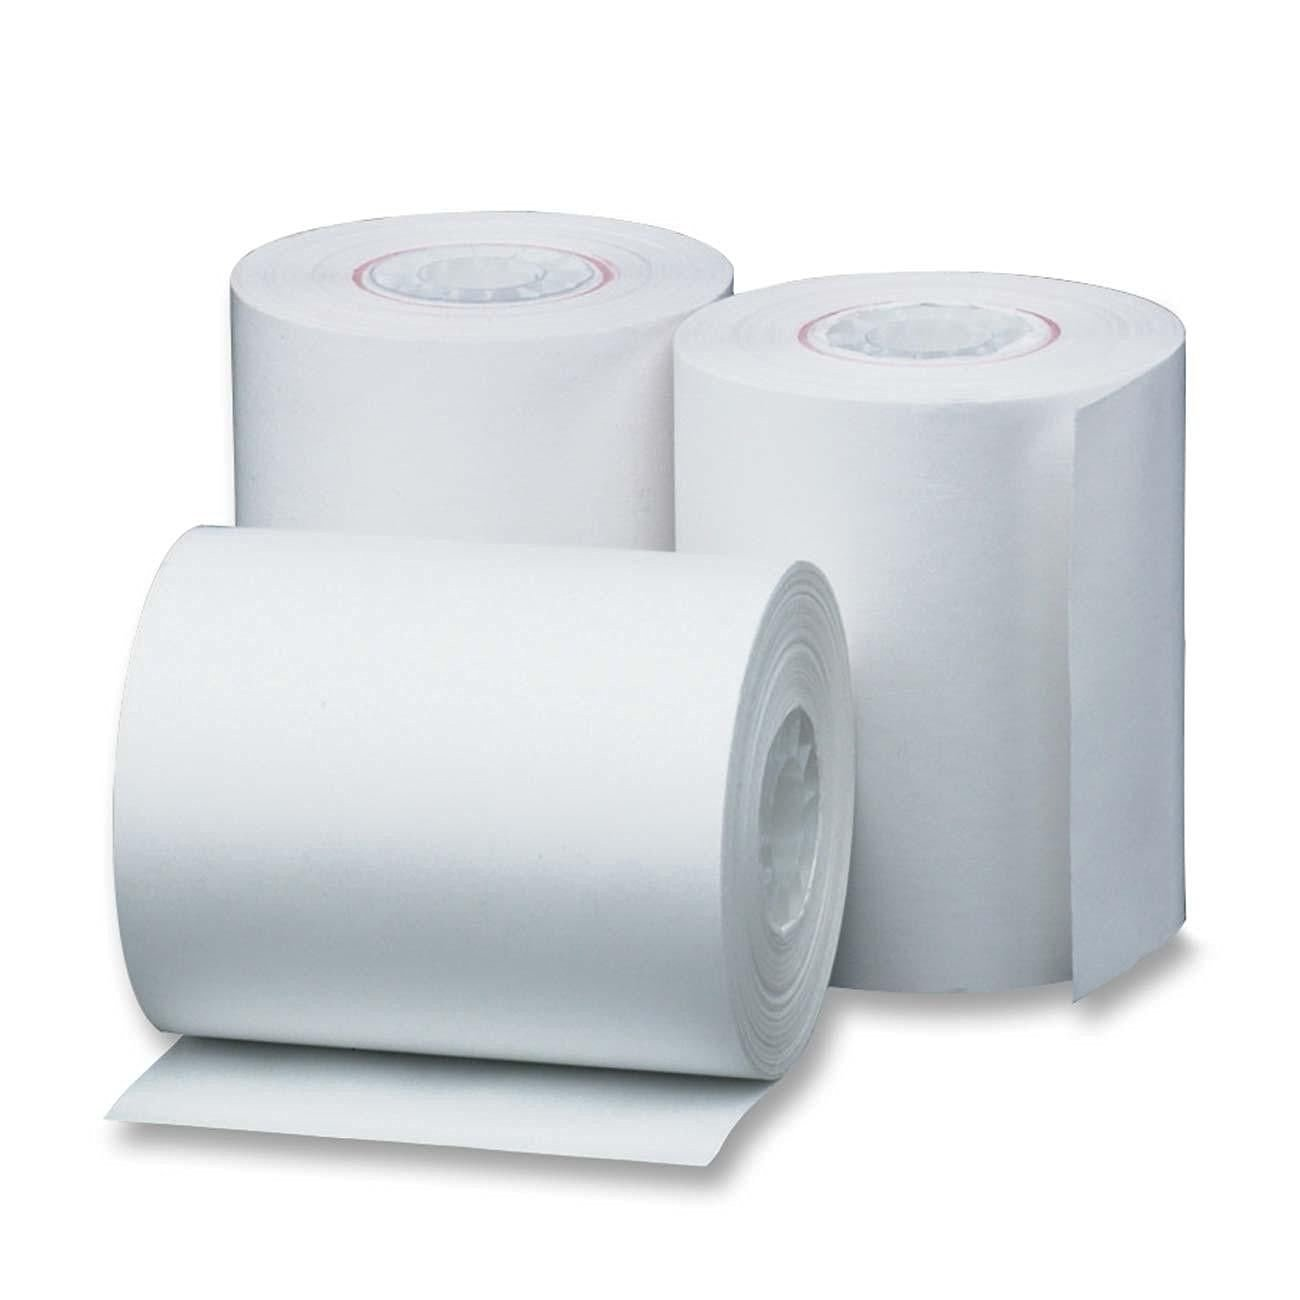 (50 Rolls) 2 1/4 x 85'Thermal Receipt Paper - Sharp XE-A302(50 Rolls)